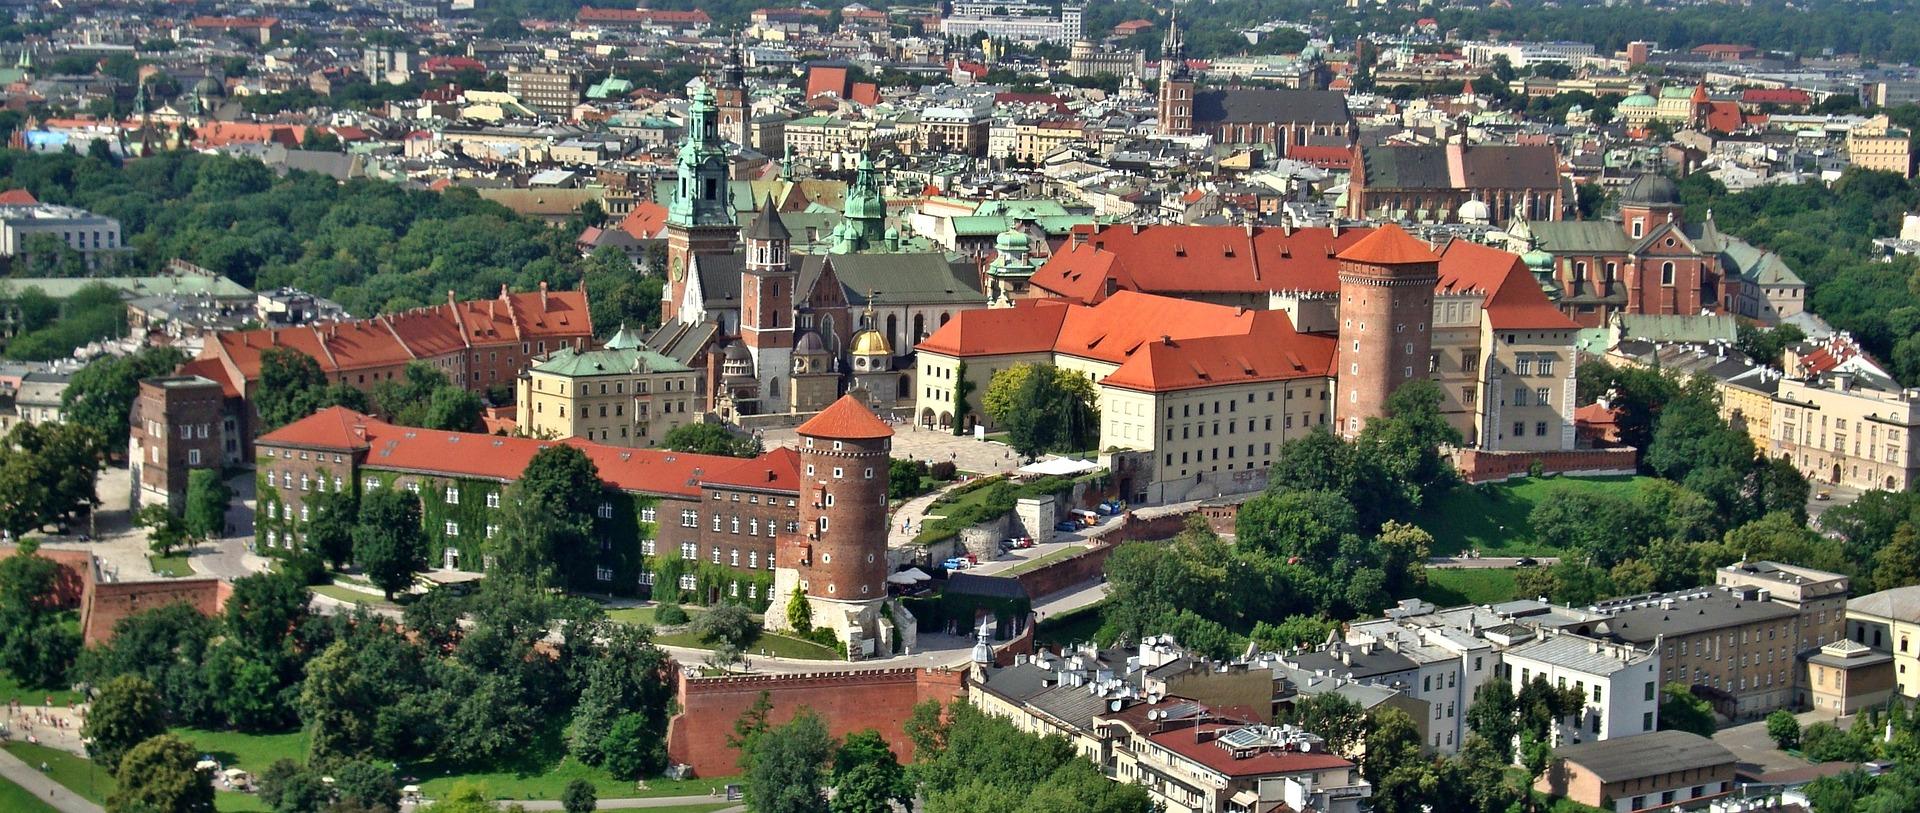 Private detectives and investigators in Poland